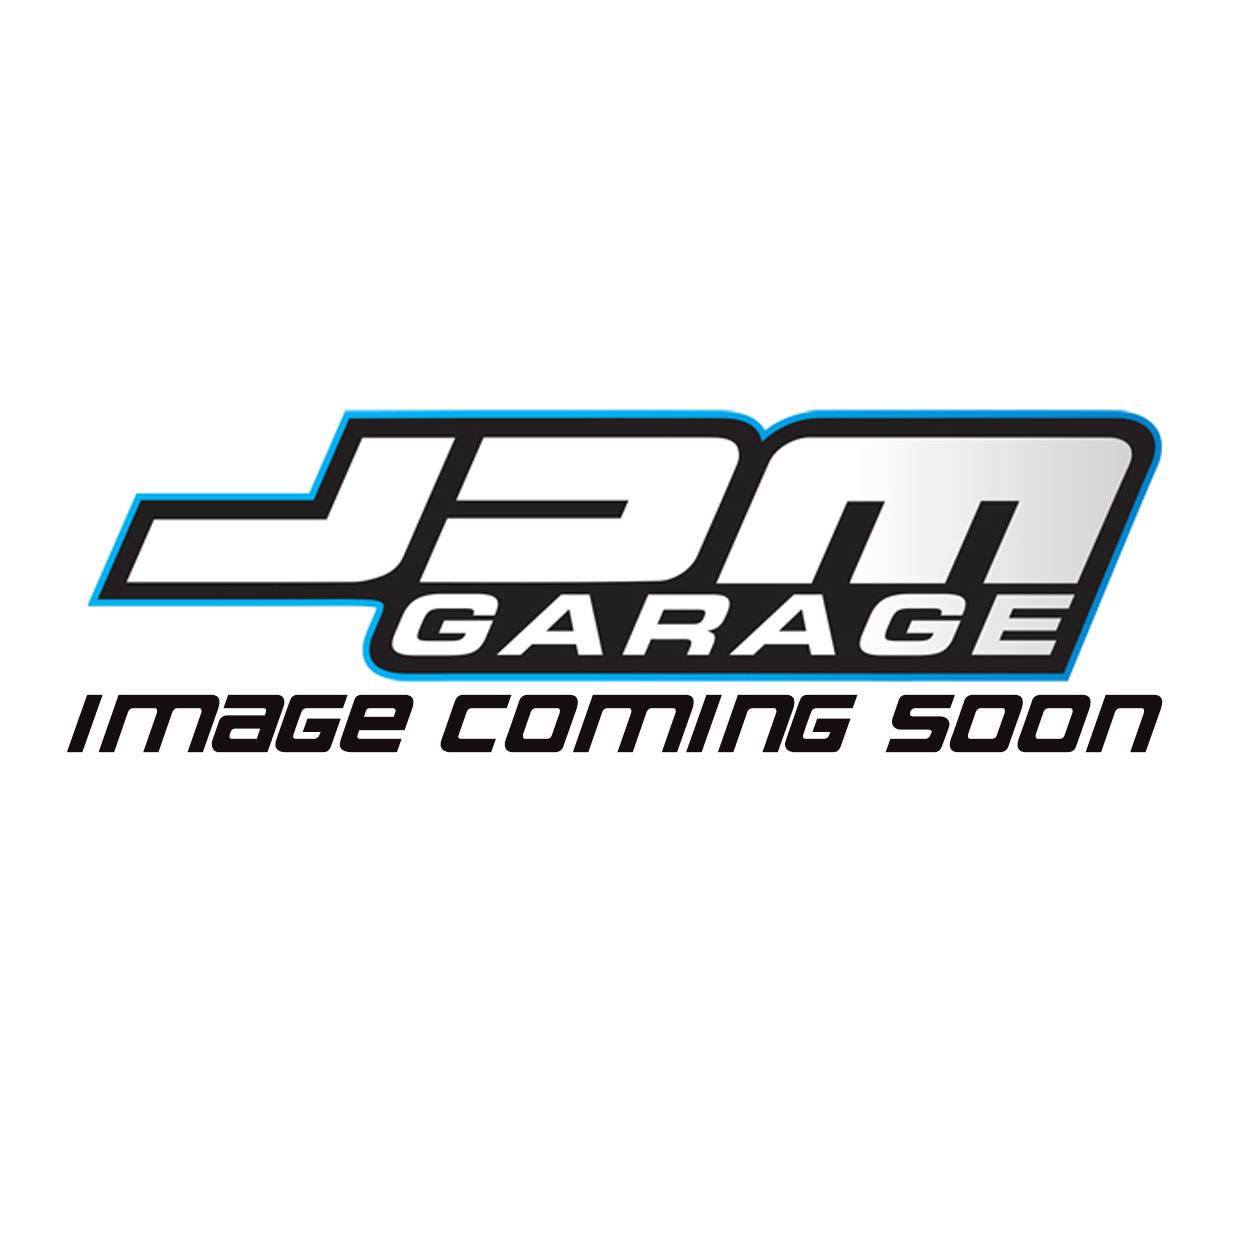 OE Replacement & EBC GD Series Front Brake Discs - Nissan Juke